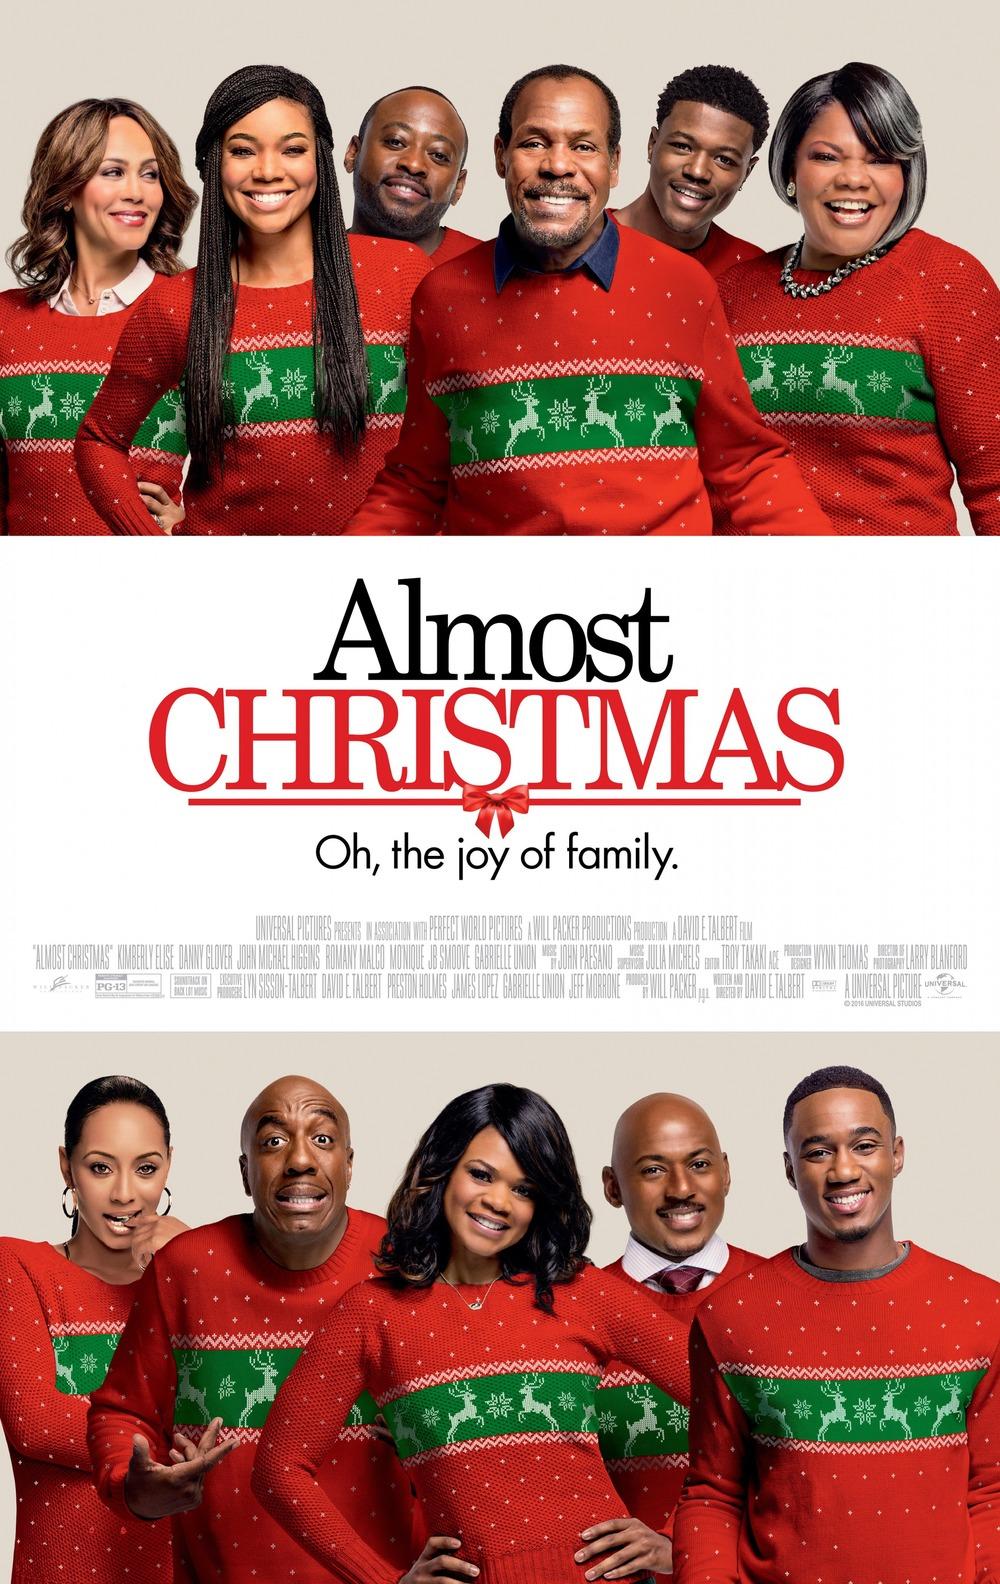 A Christmas Wish Movie Trailer